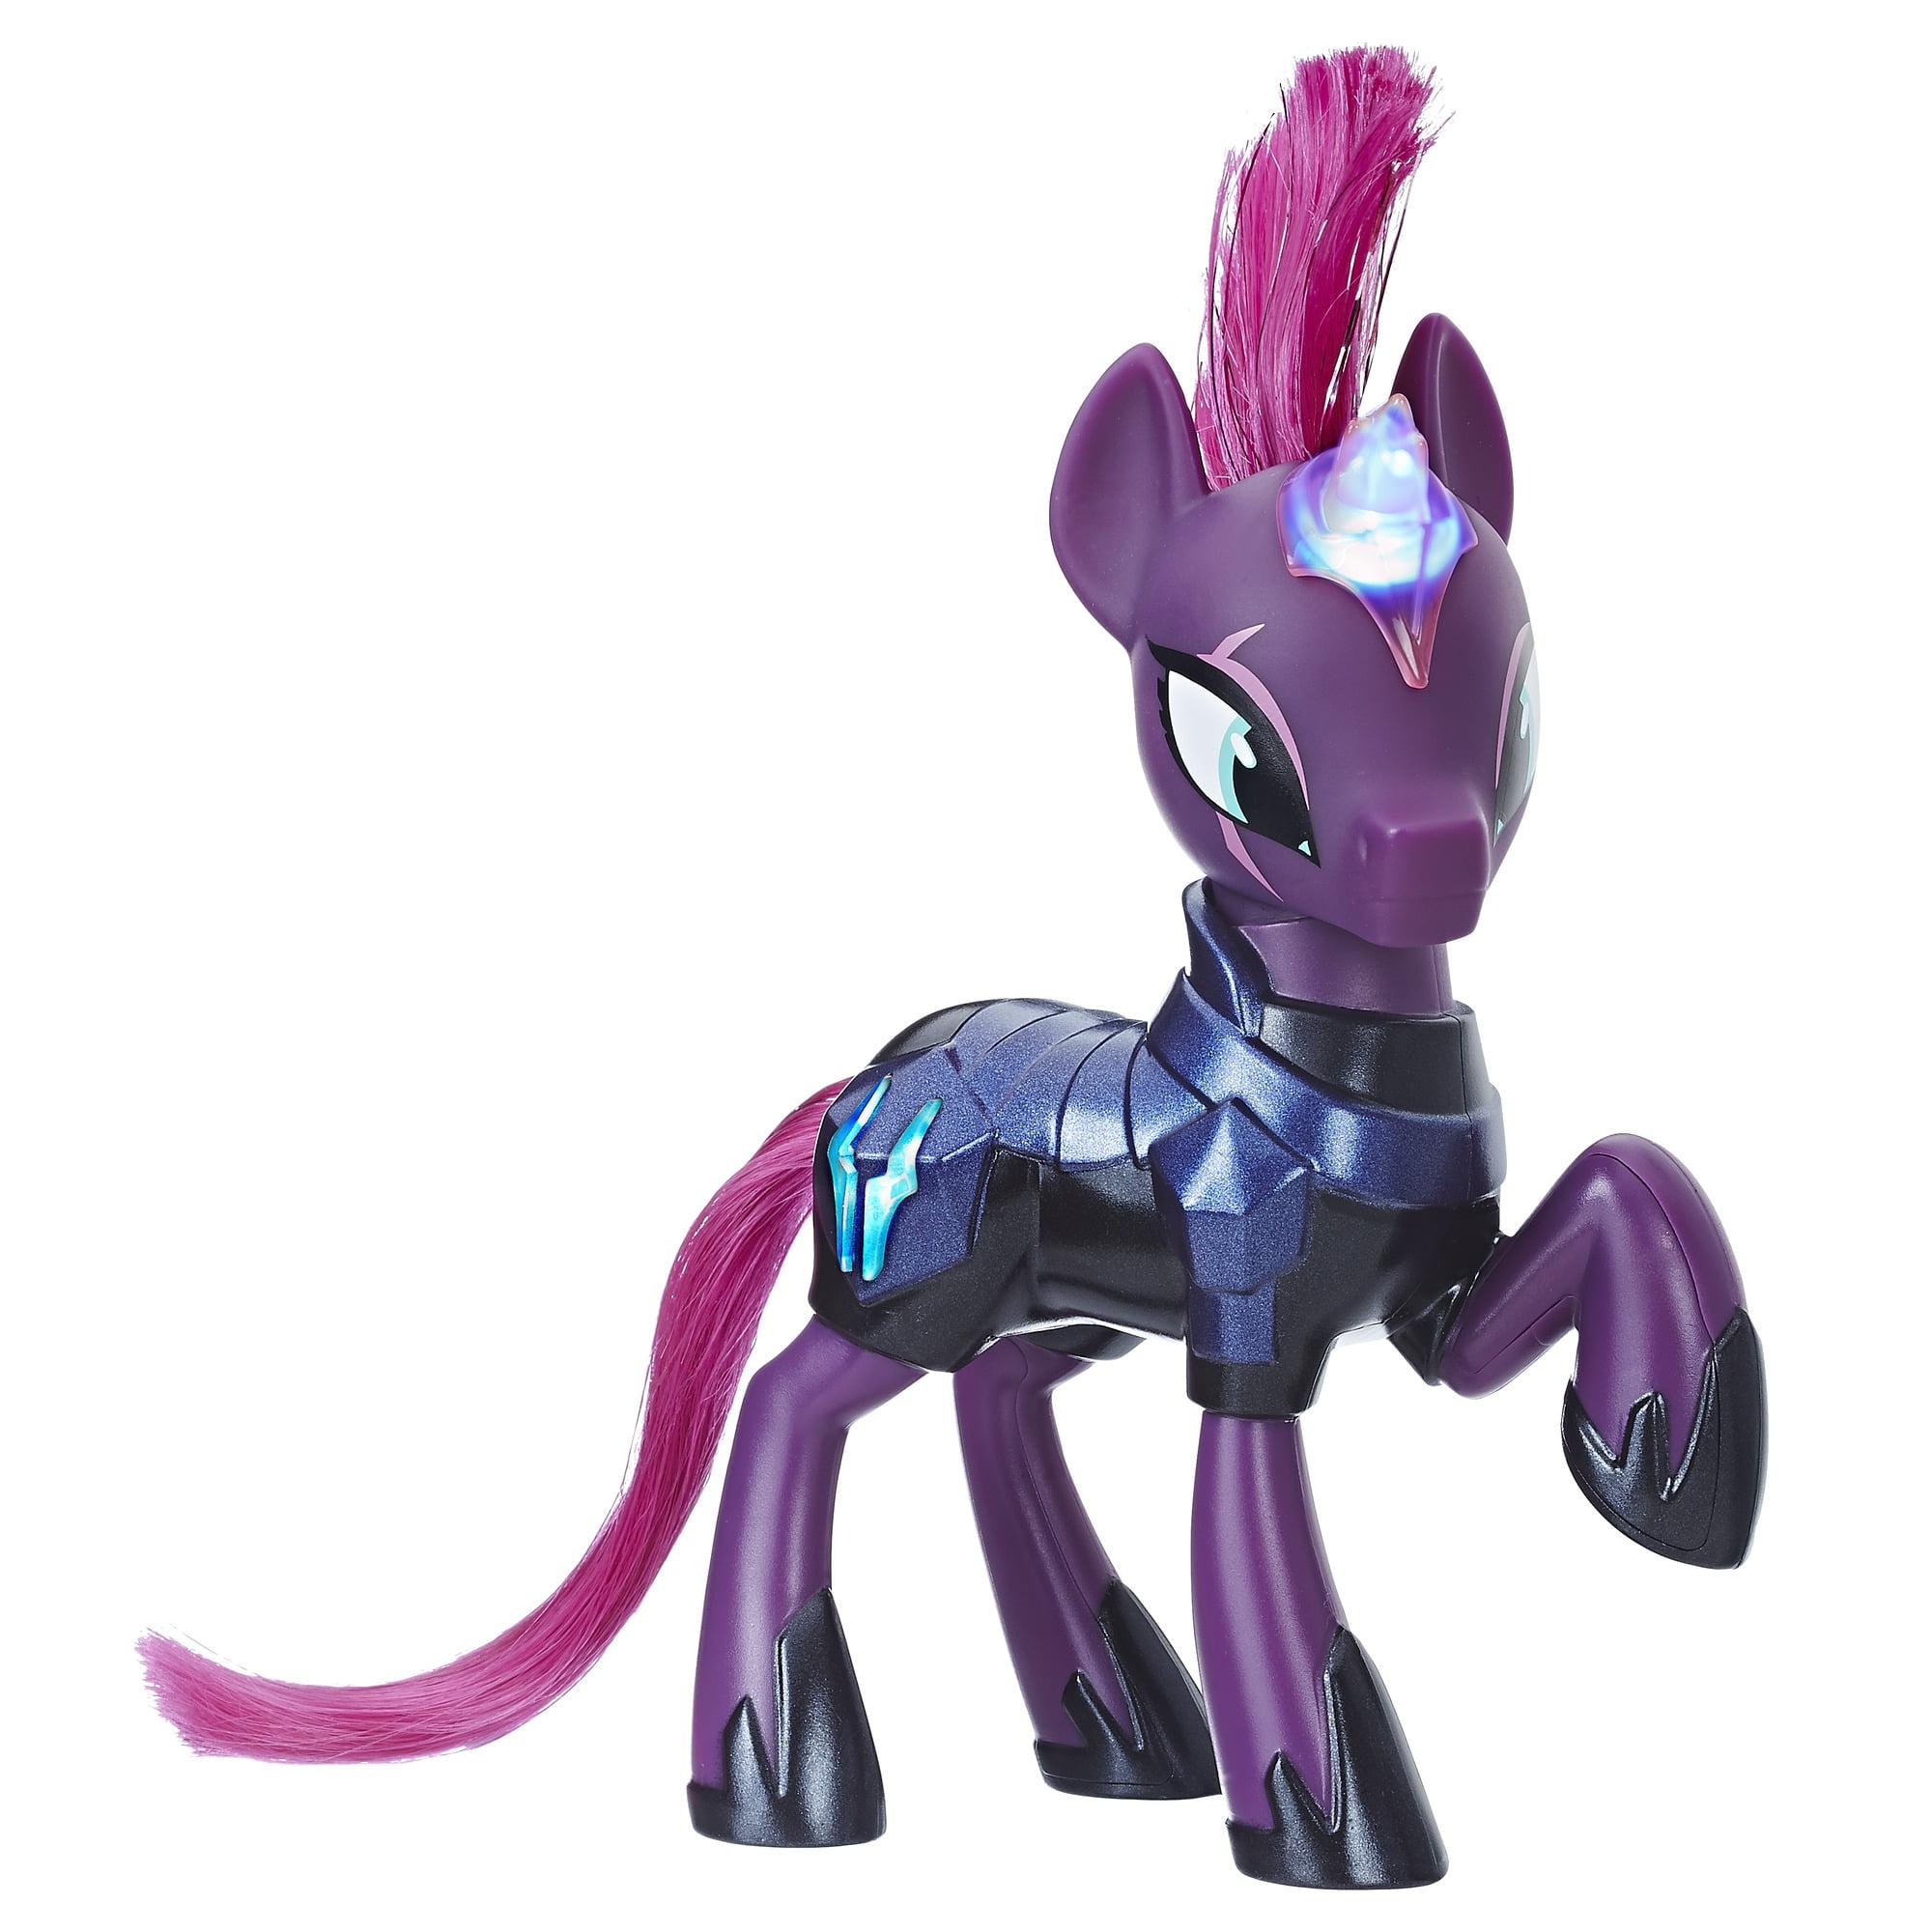 My Little Pony: The Movie Lightning Glow Tempest Shadow